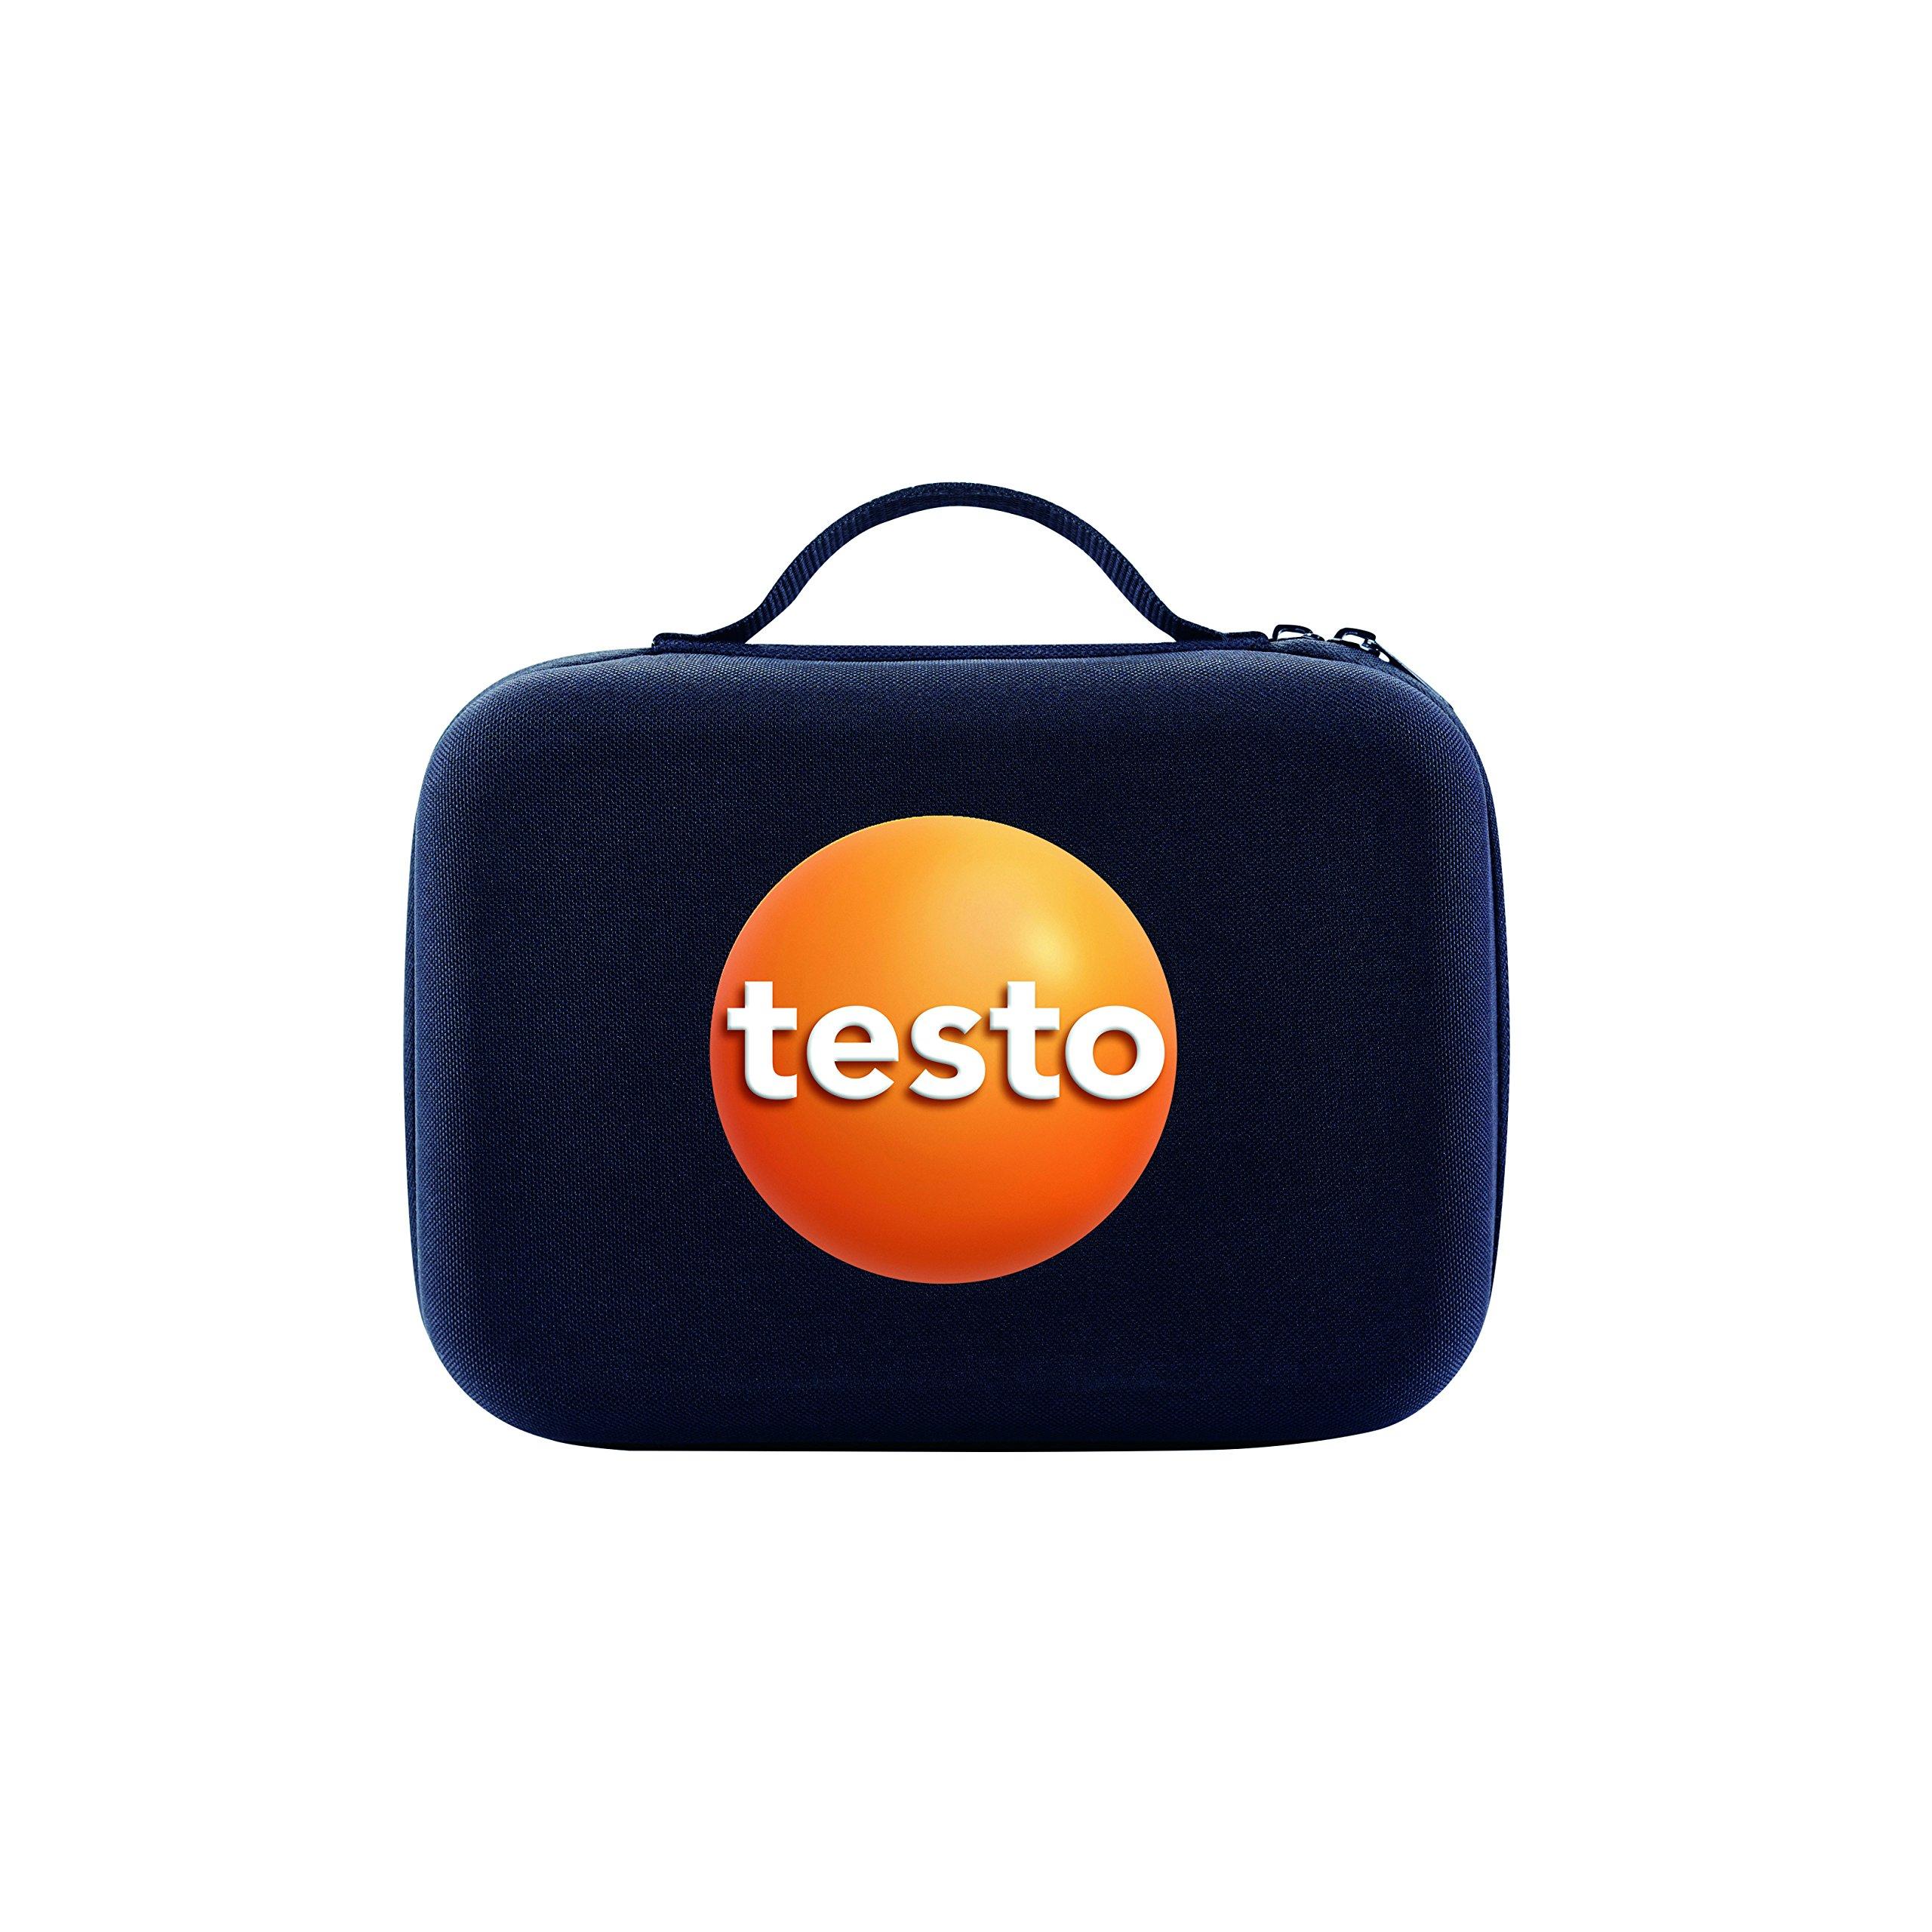 Testo 0563 0002 Refrigeration Wireless Smart Probe Set by Testo (Image #3)